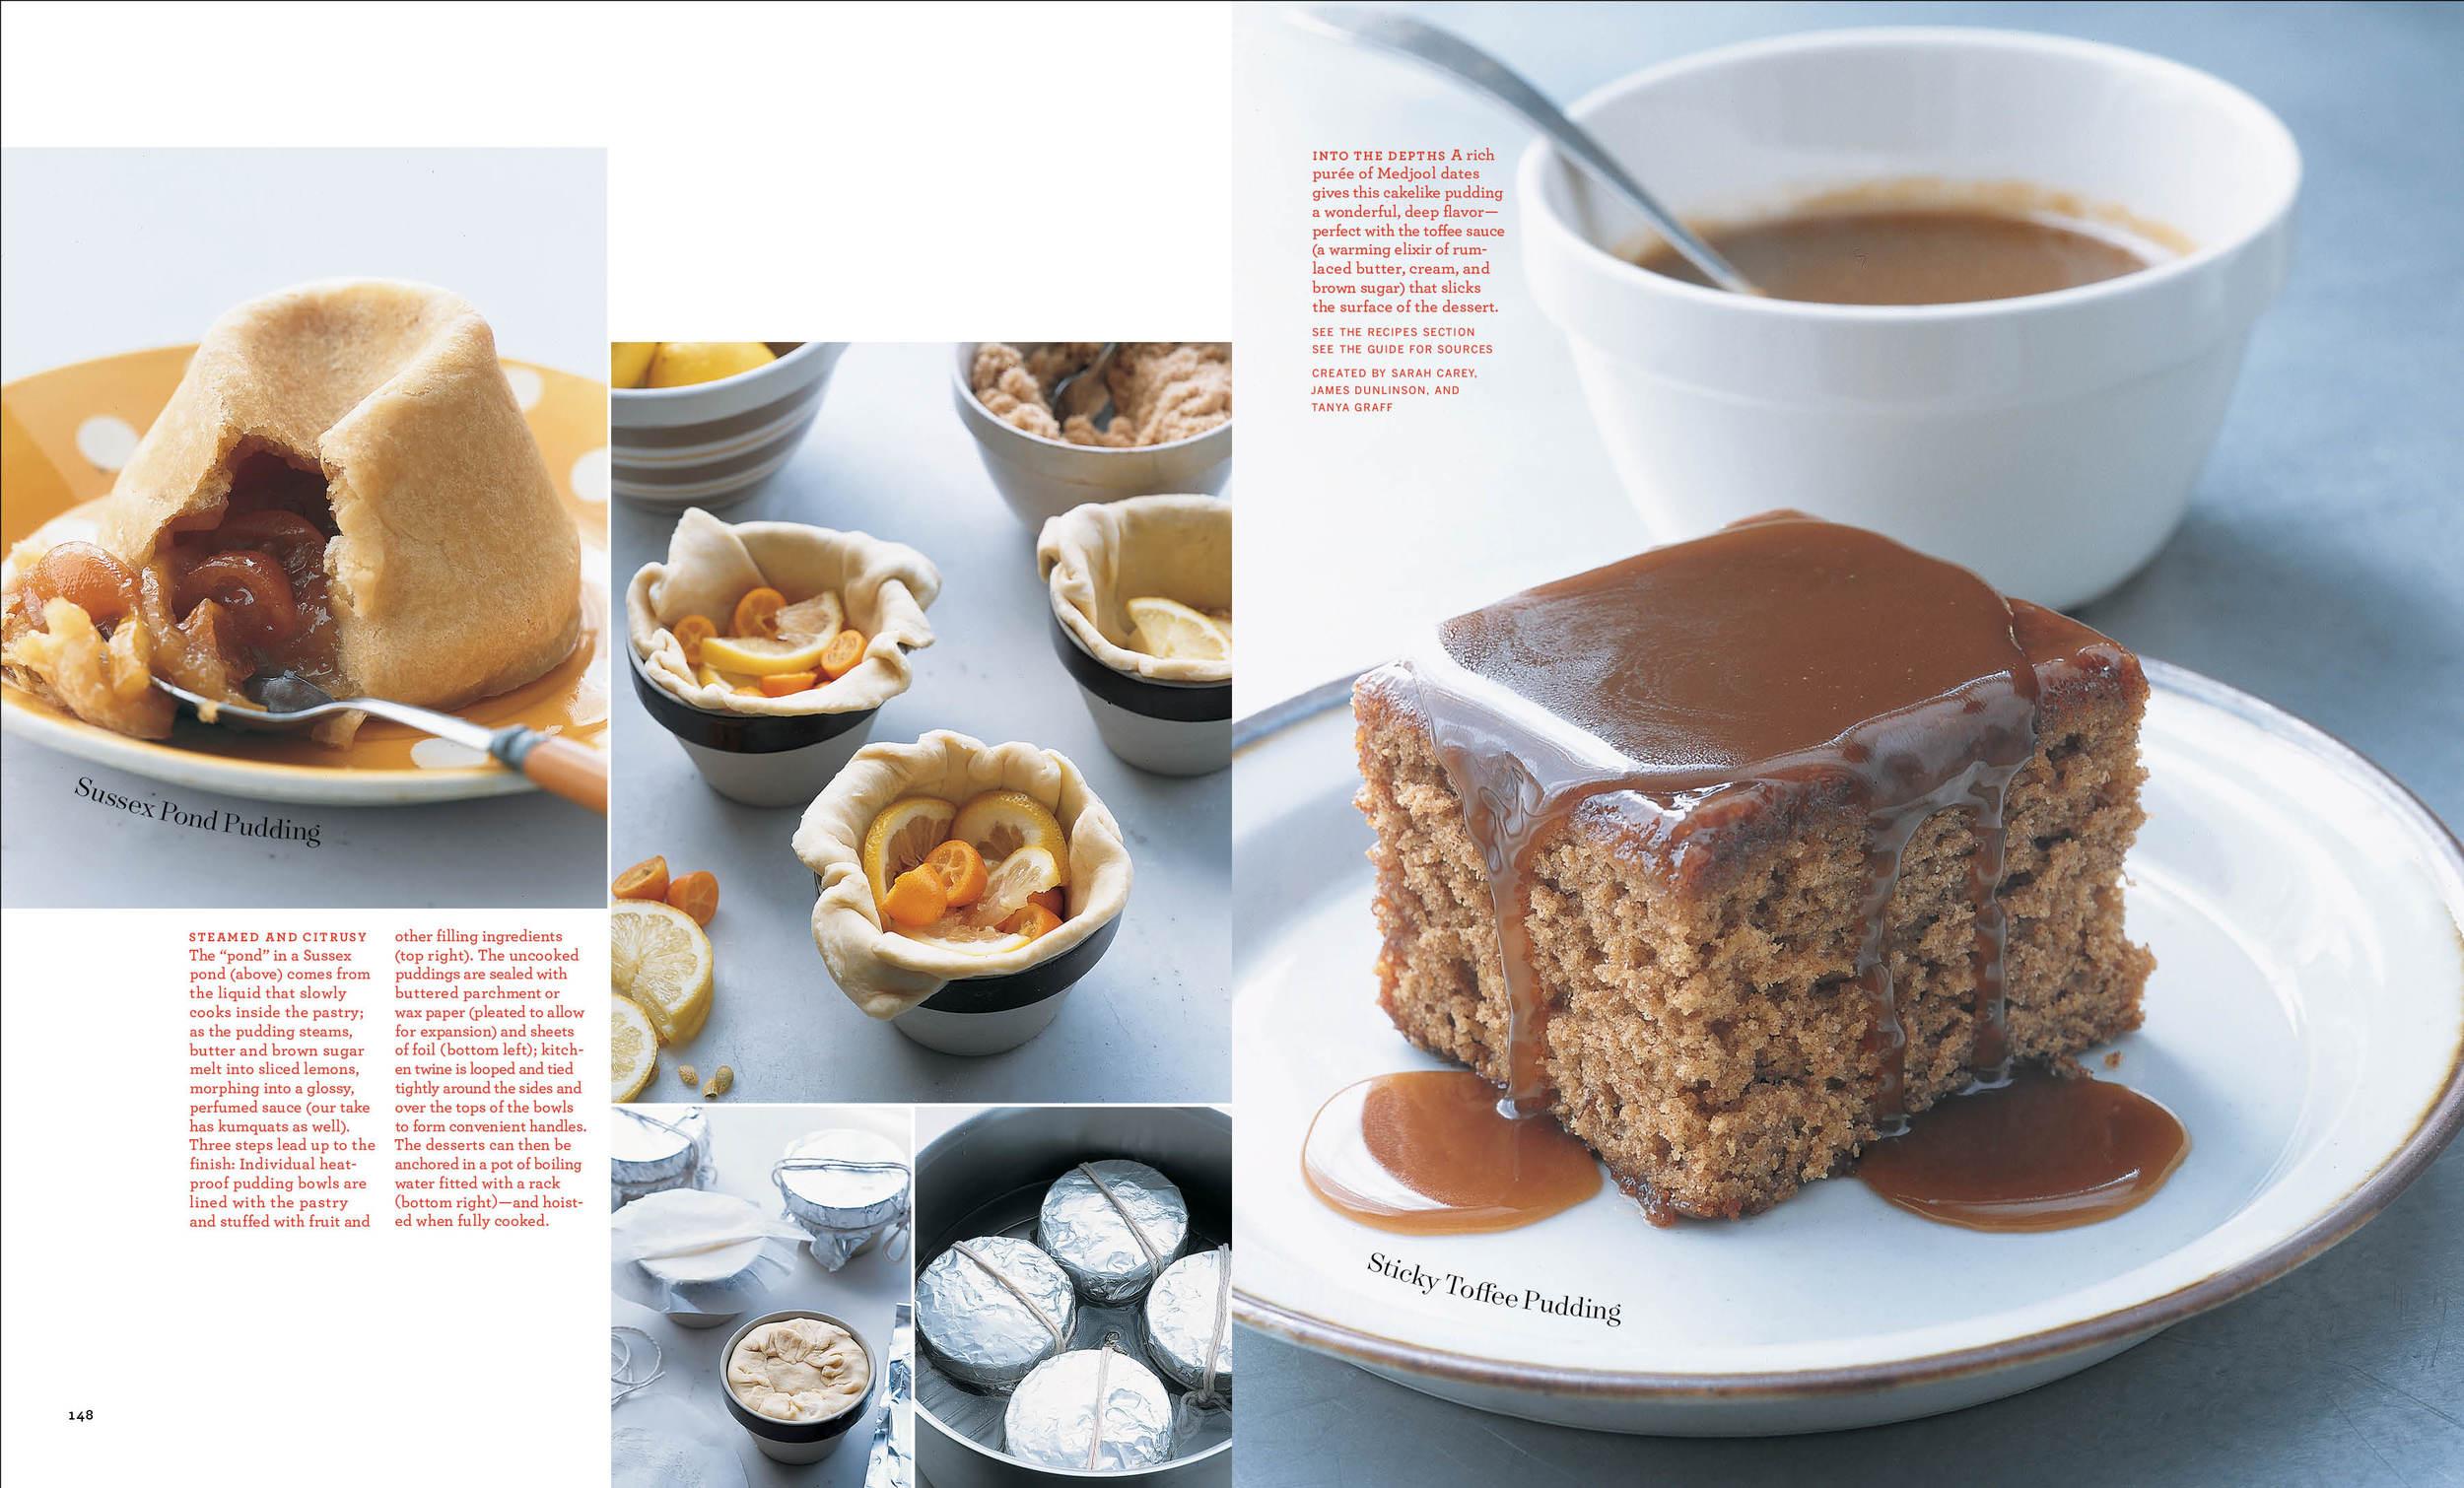 Puddings4 copy.jpg